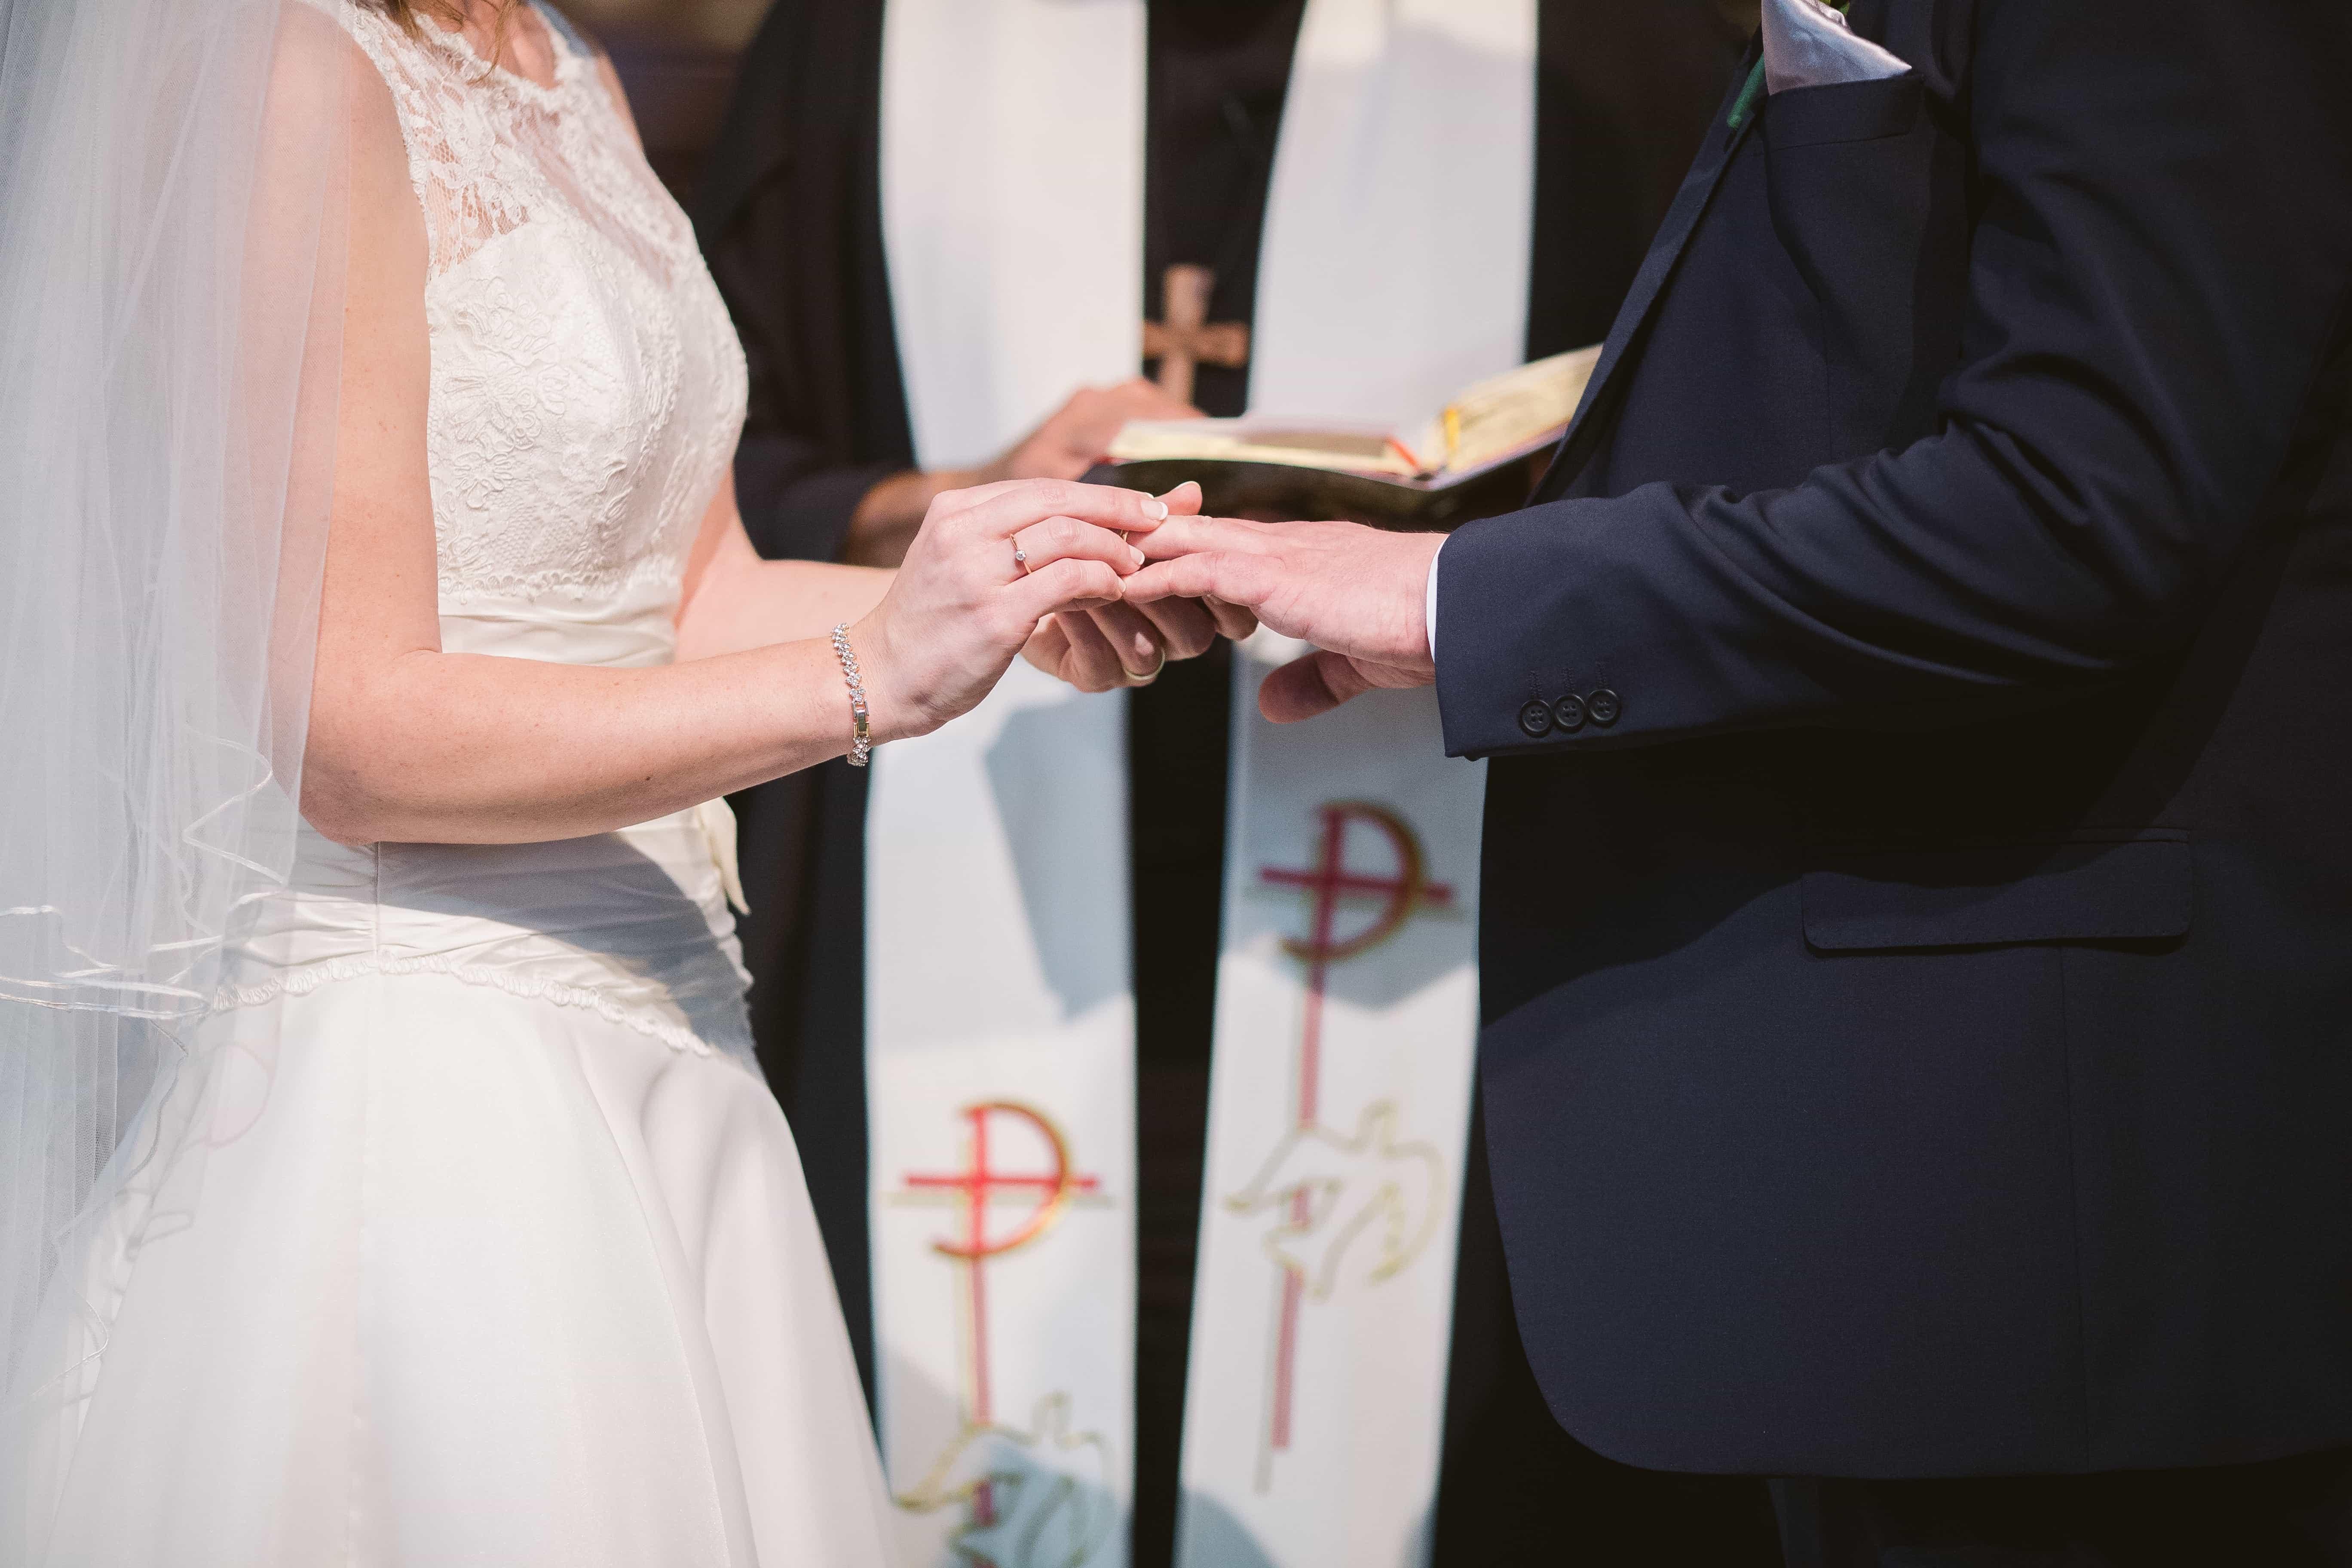 Photo by Wedding Photography on Unsplash, https://unsplash.com/photos/RJDWzHyh6gE